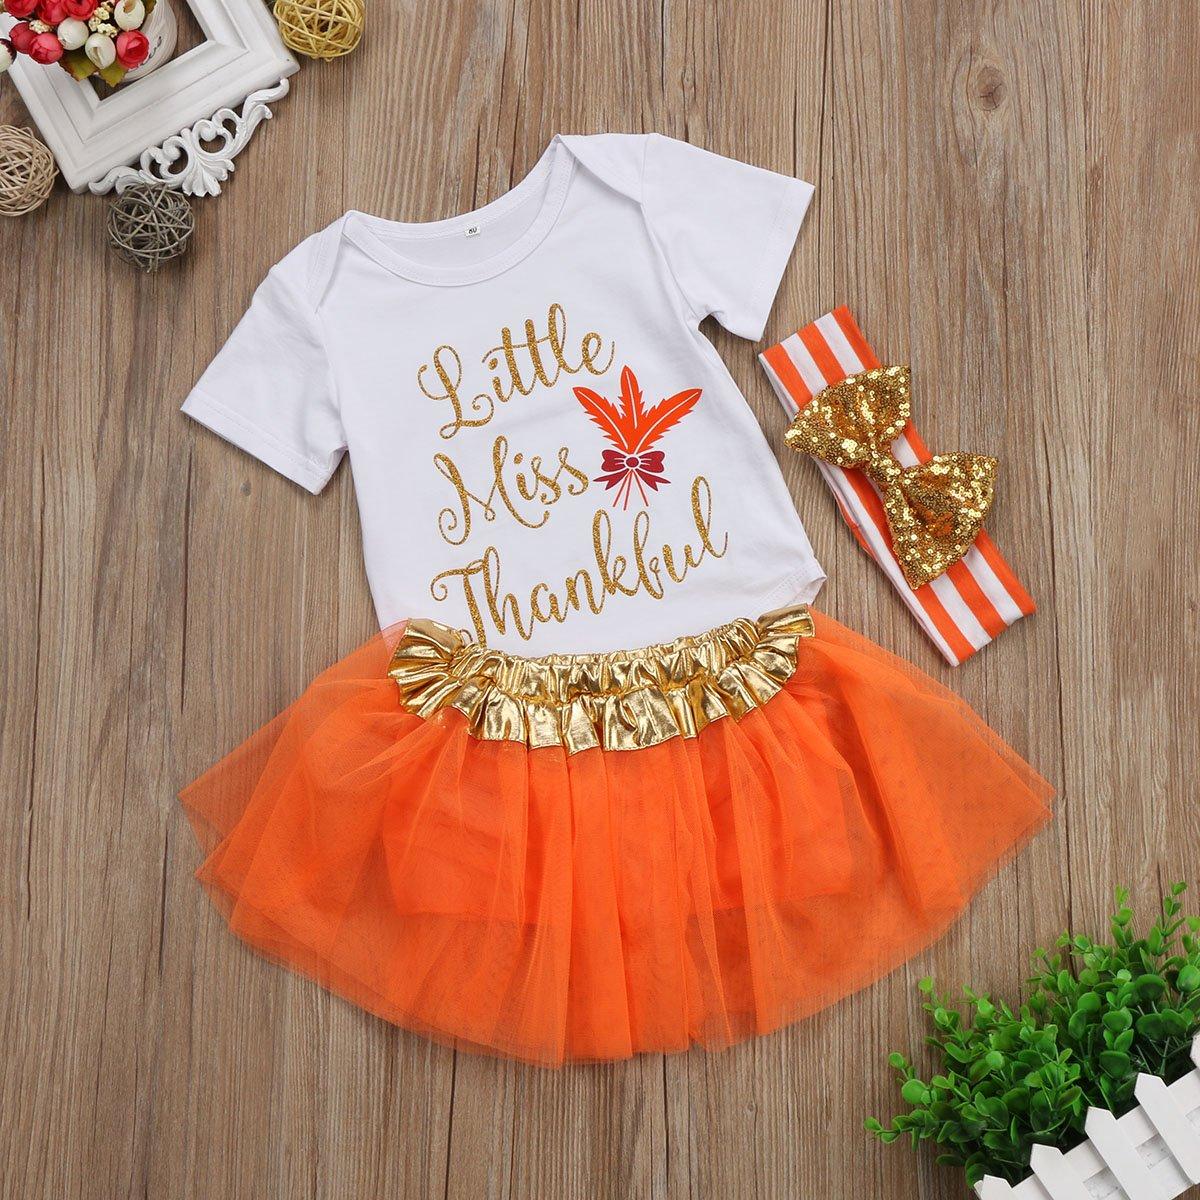 Baby Girl Halloween Thanksgiving Outfit,Letter Print Bodysuit Romper+Tutu Skirt+Headband Clothes Set